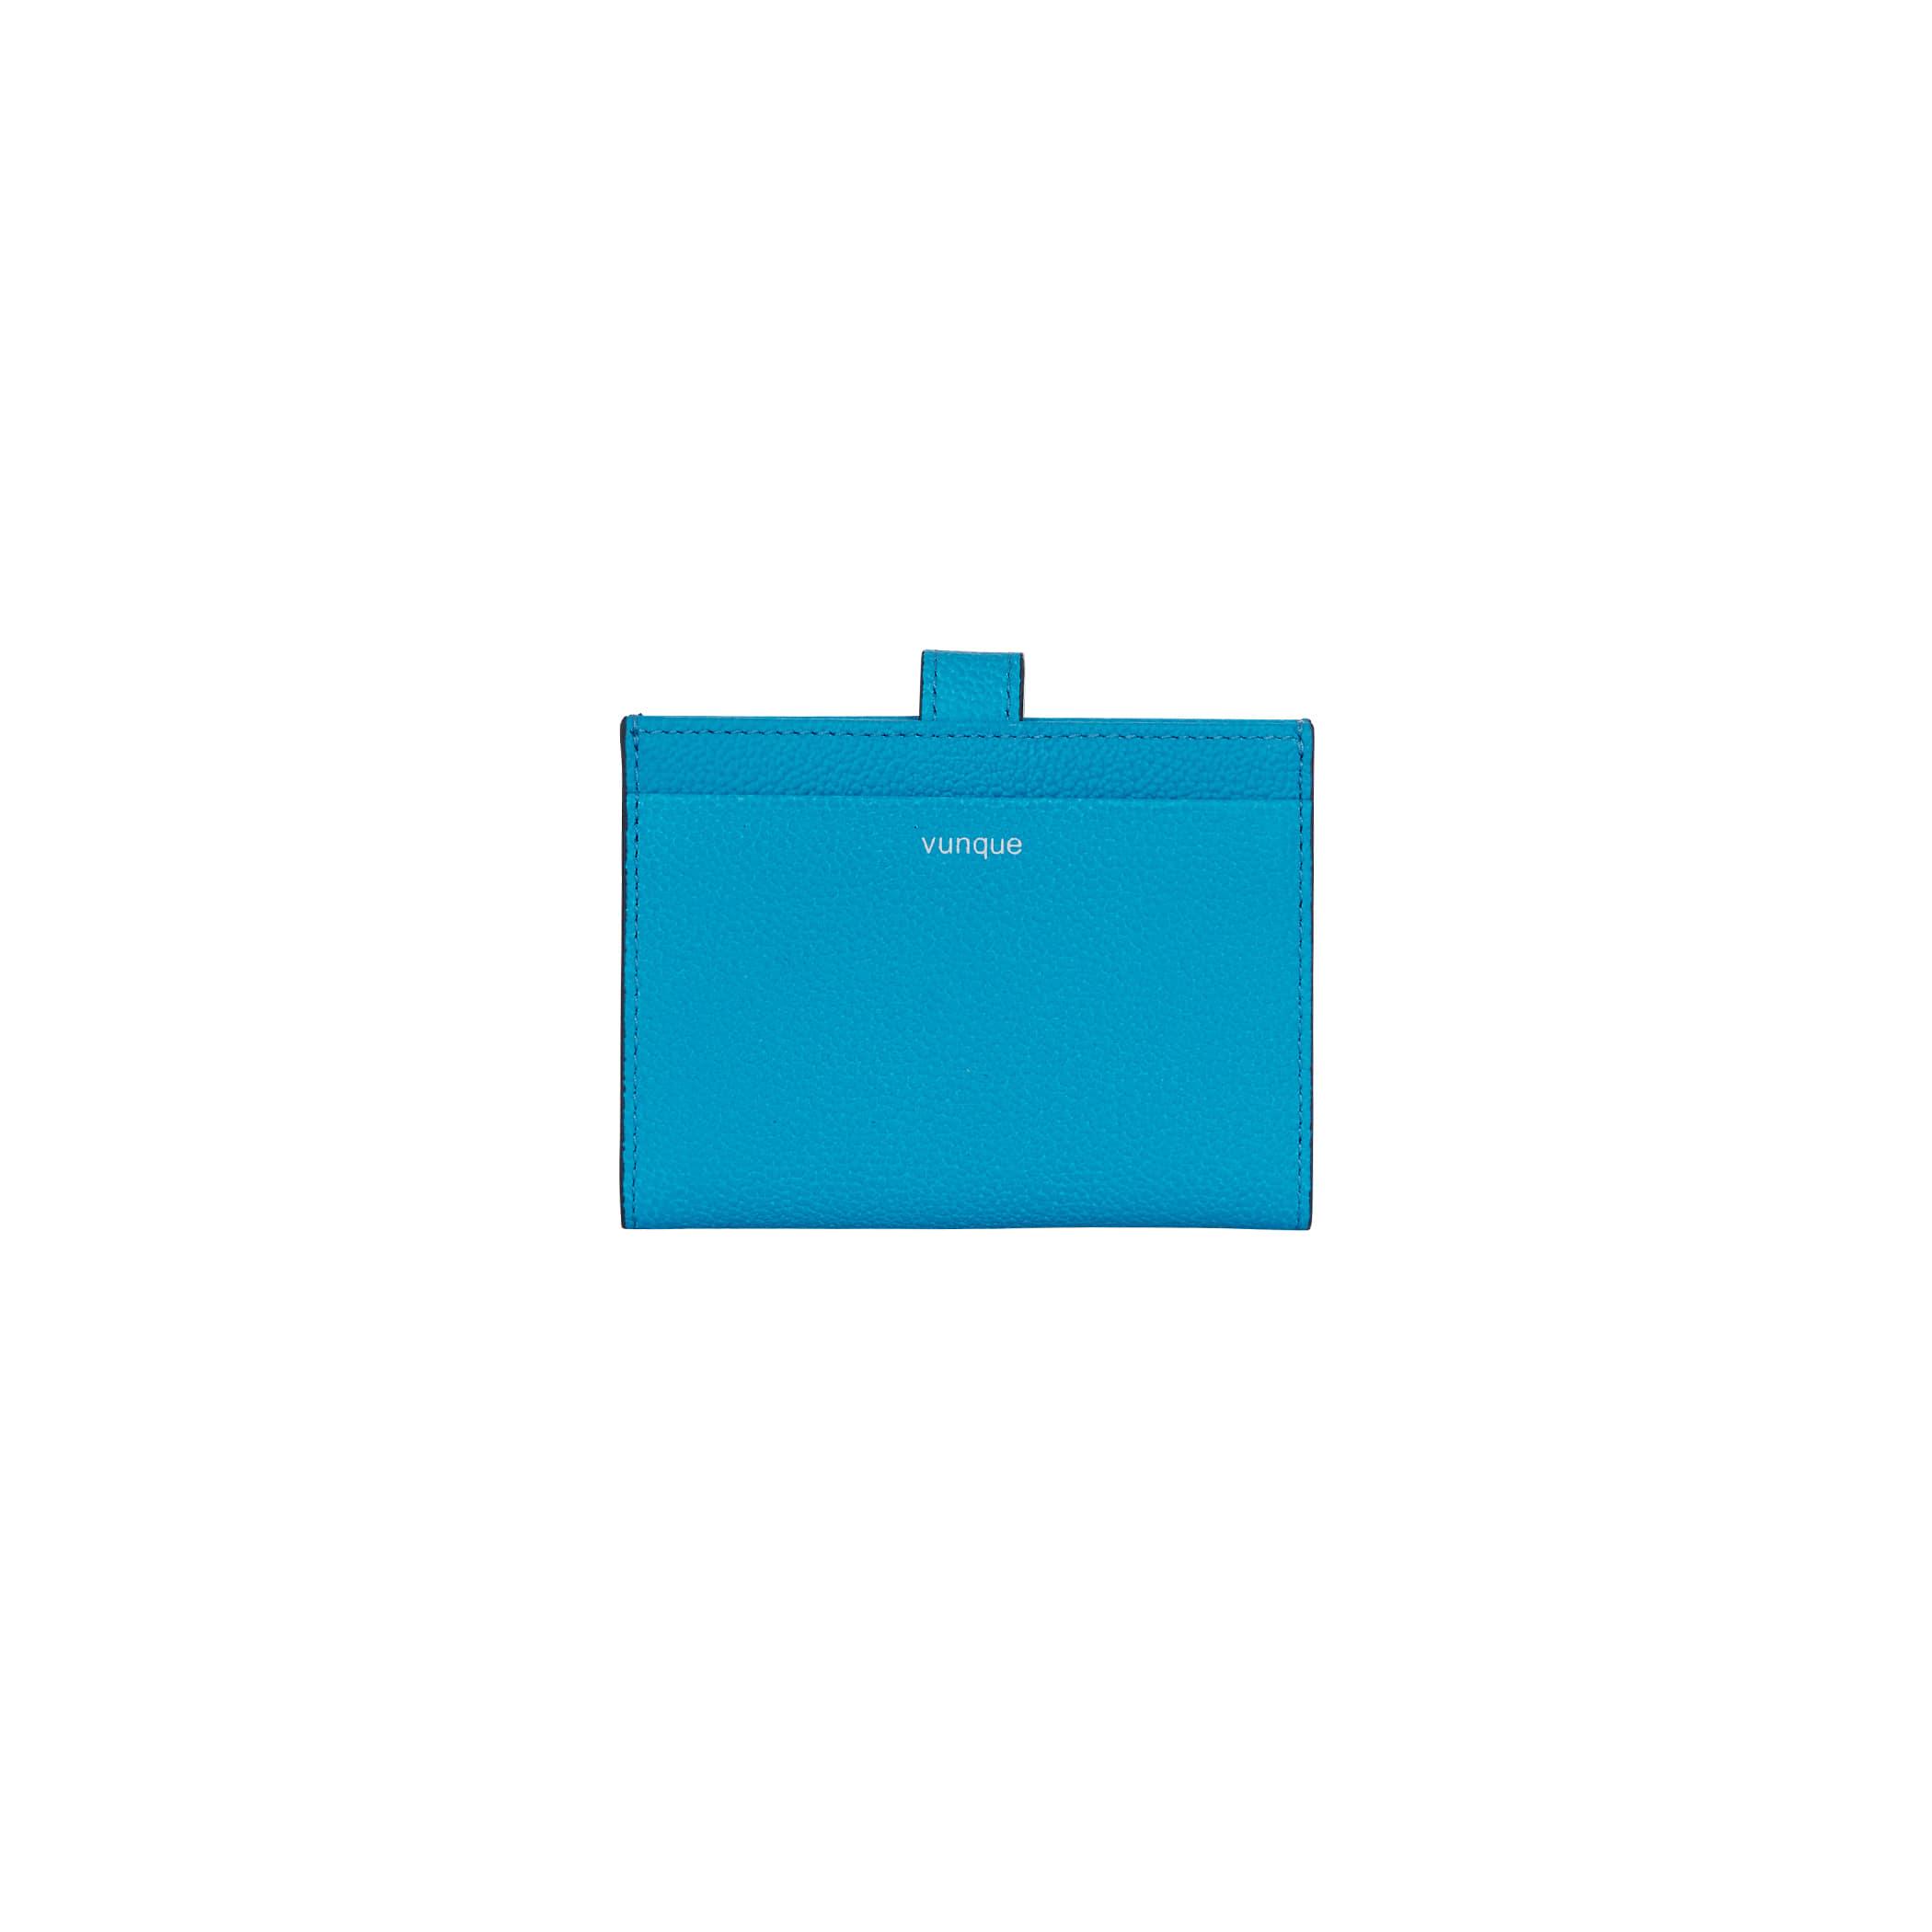 Magpie Card Wallet (맥파이 카드지갑) Fine blue